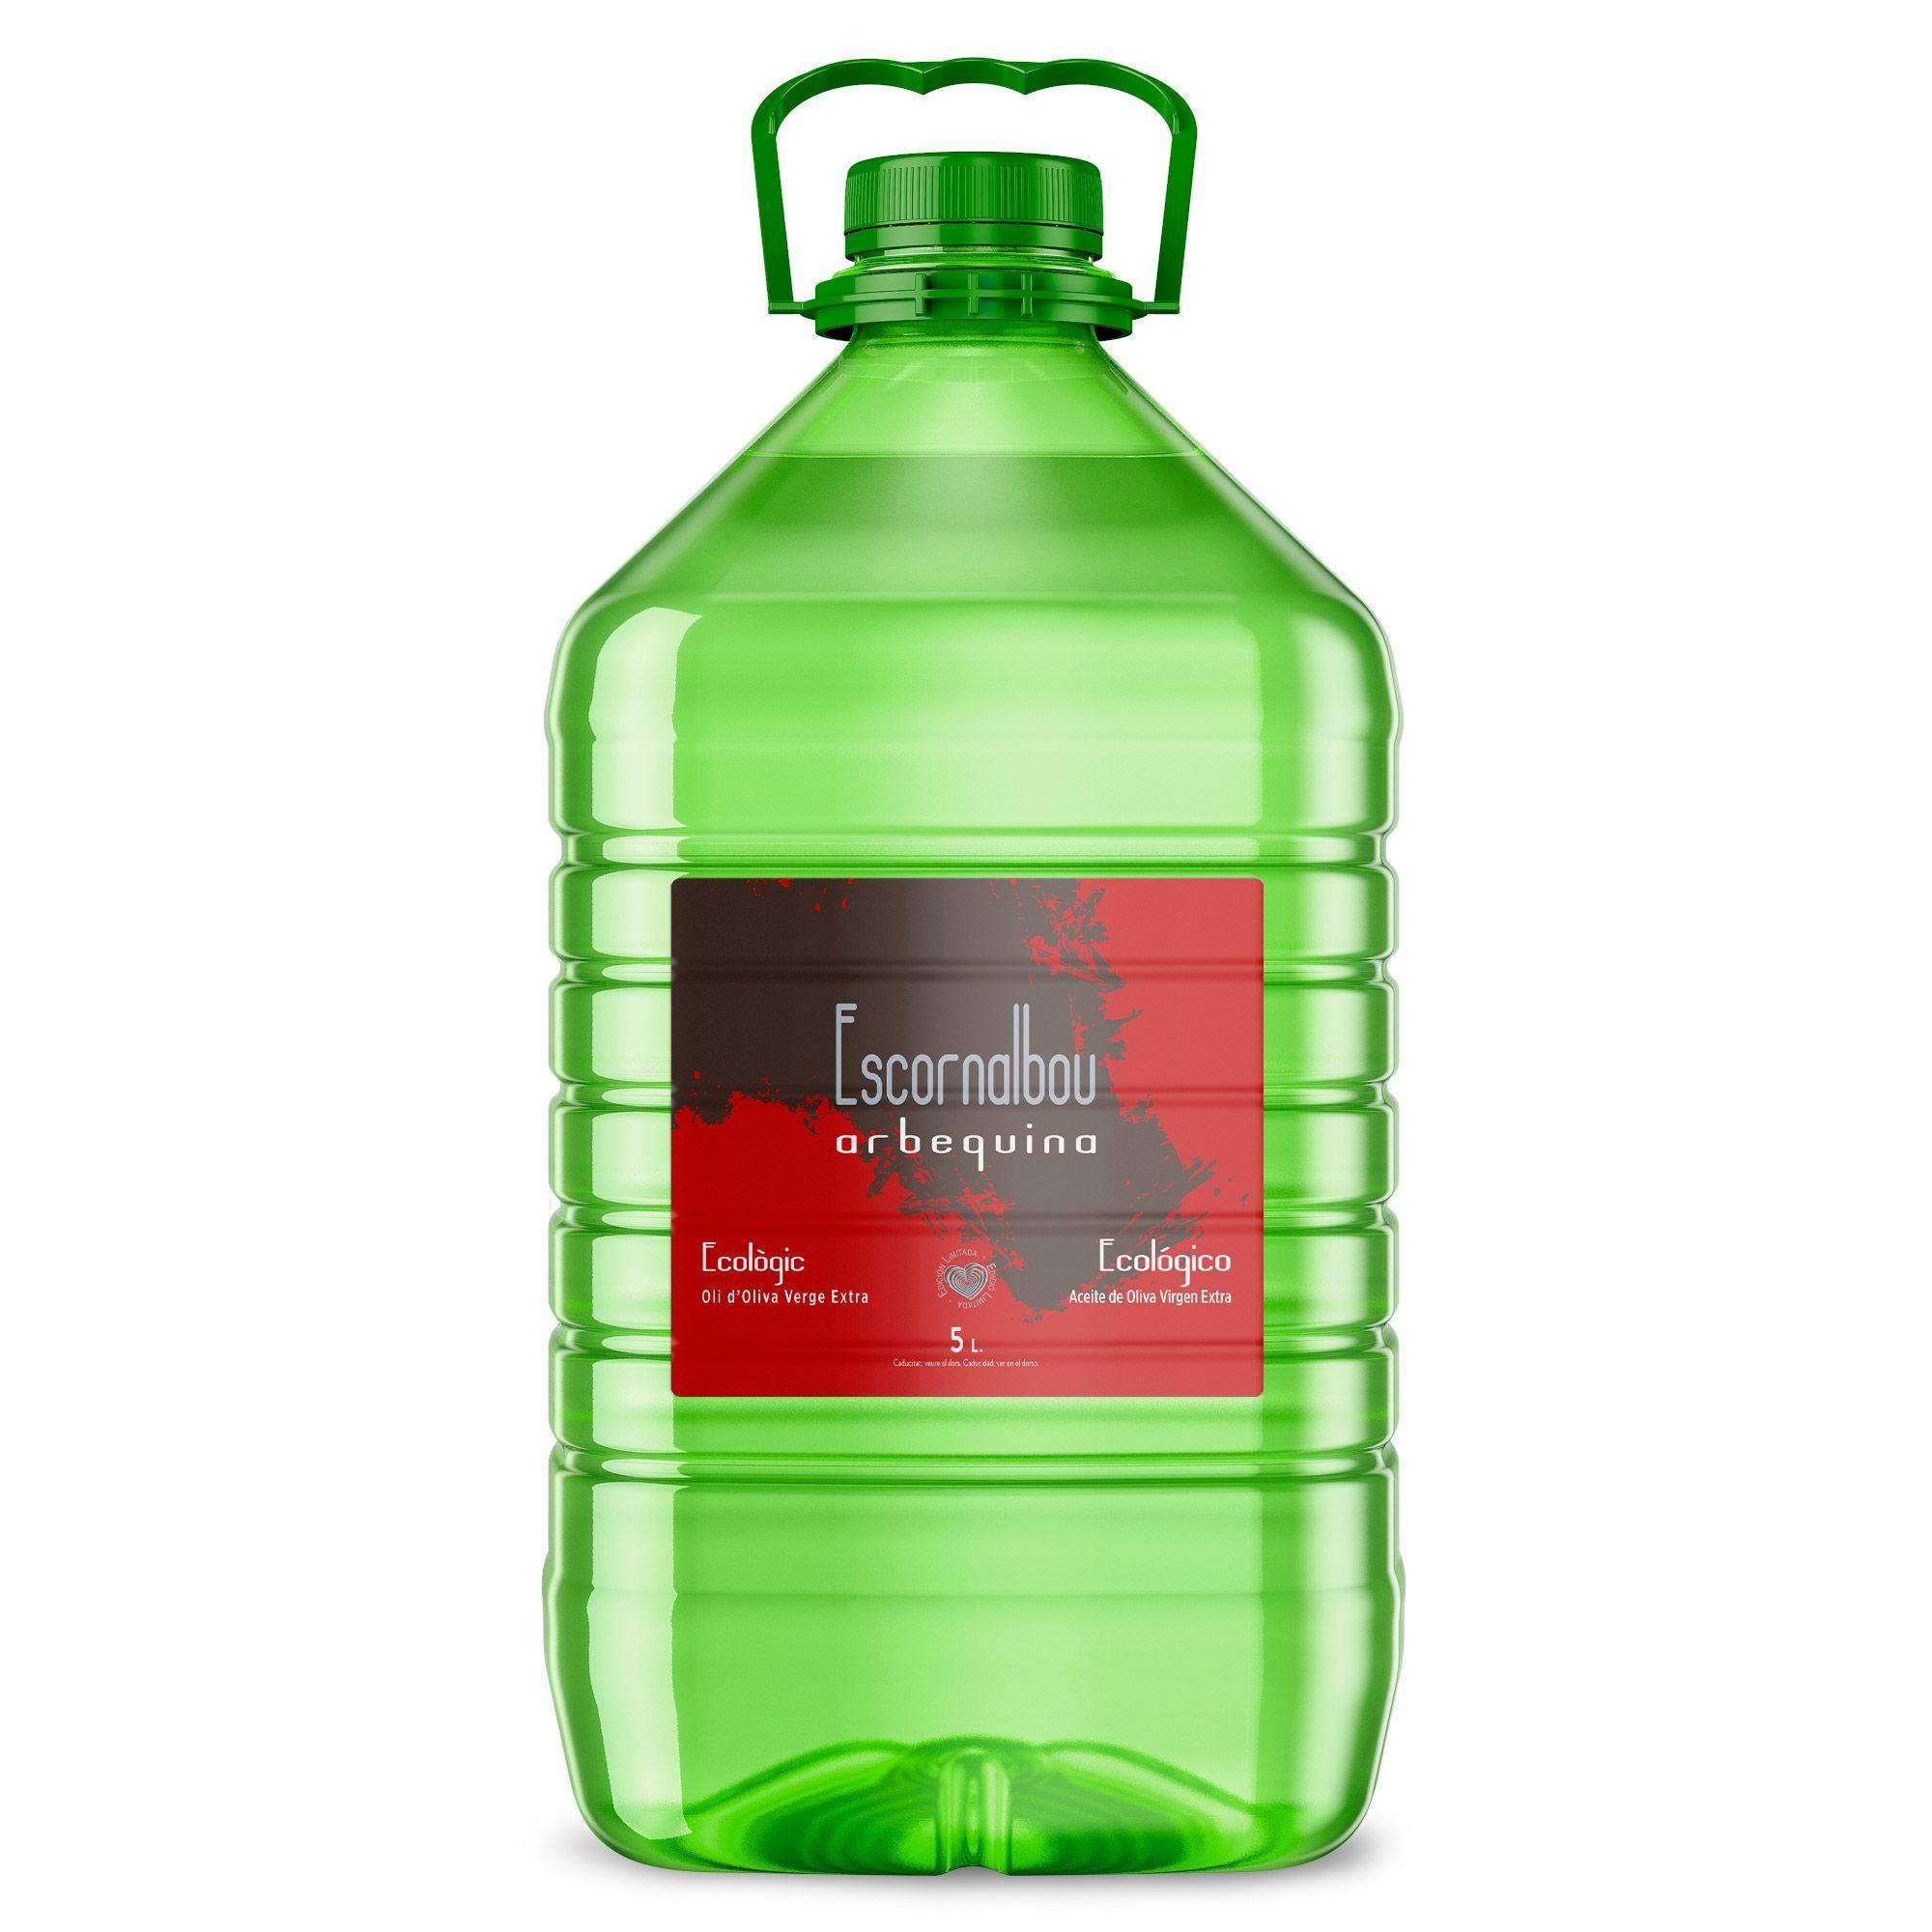 Comprar 5 L Aceite De Oliva Virgen Extra ECOLÓGICO 100% Arbequina - Garrafa PET | Escornalbou Gourmet